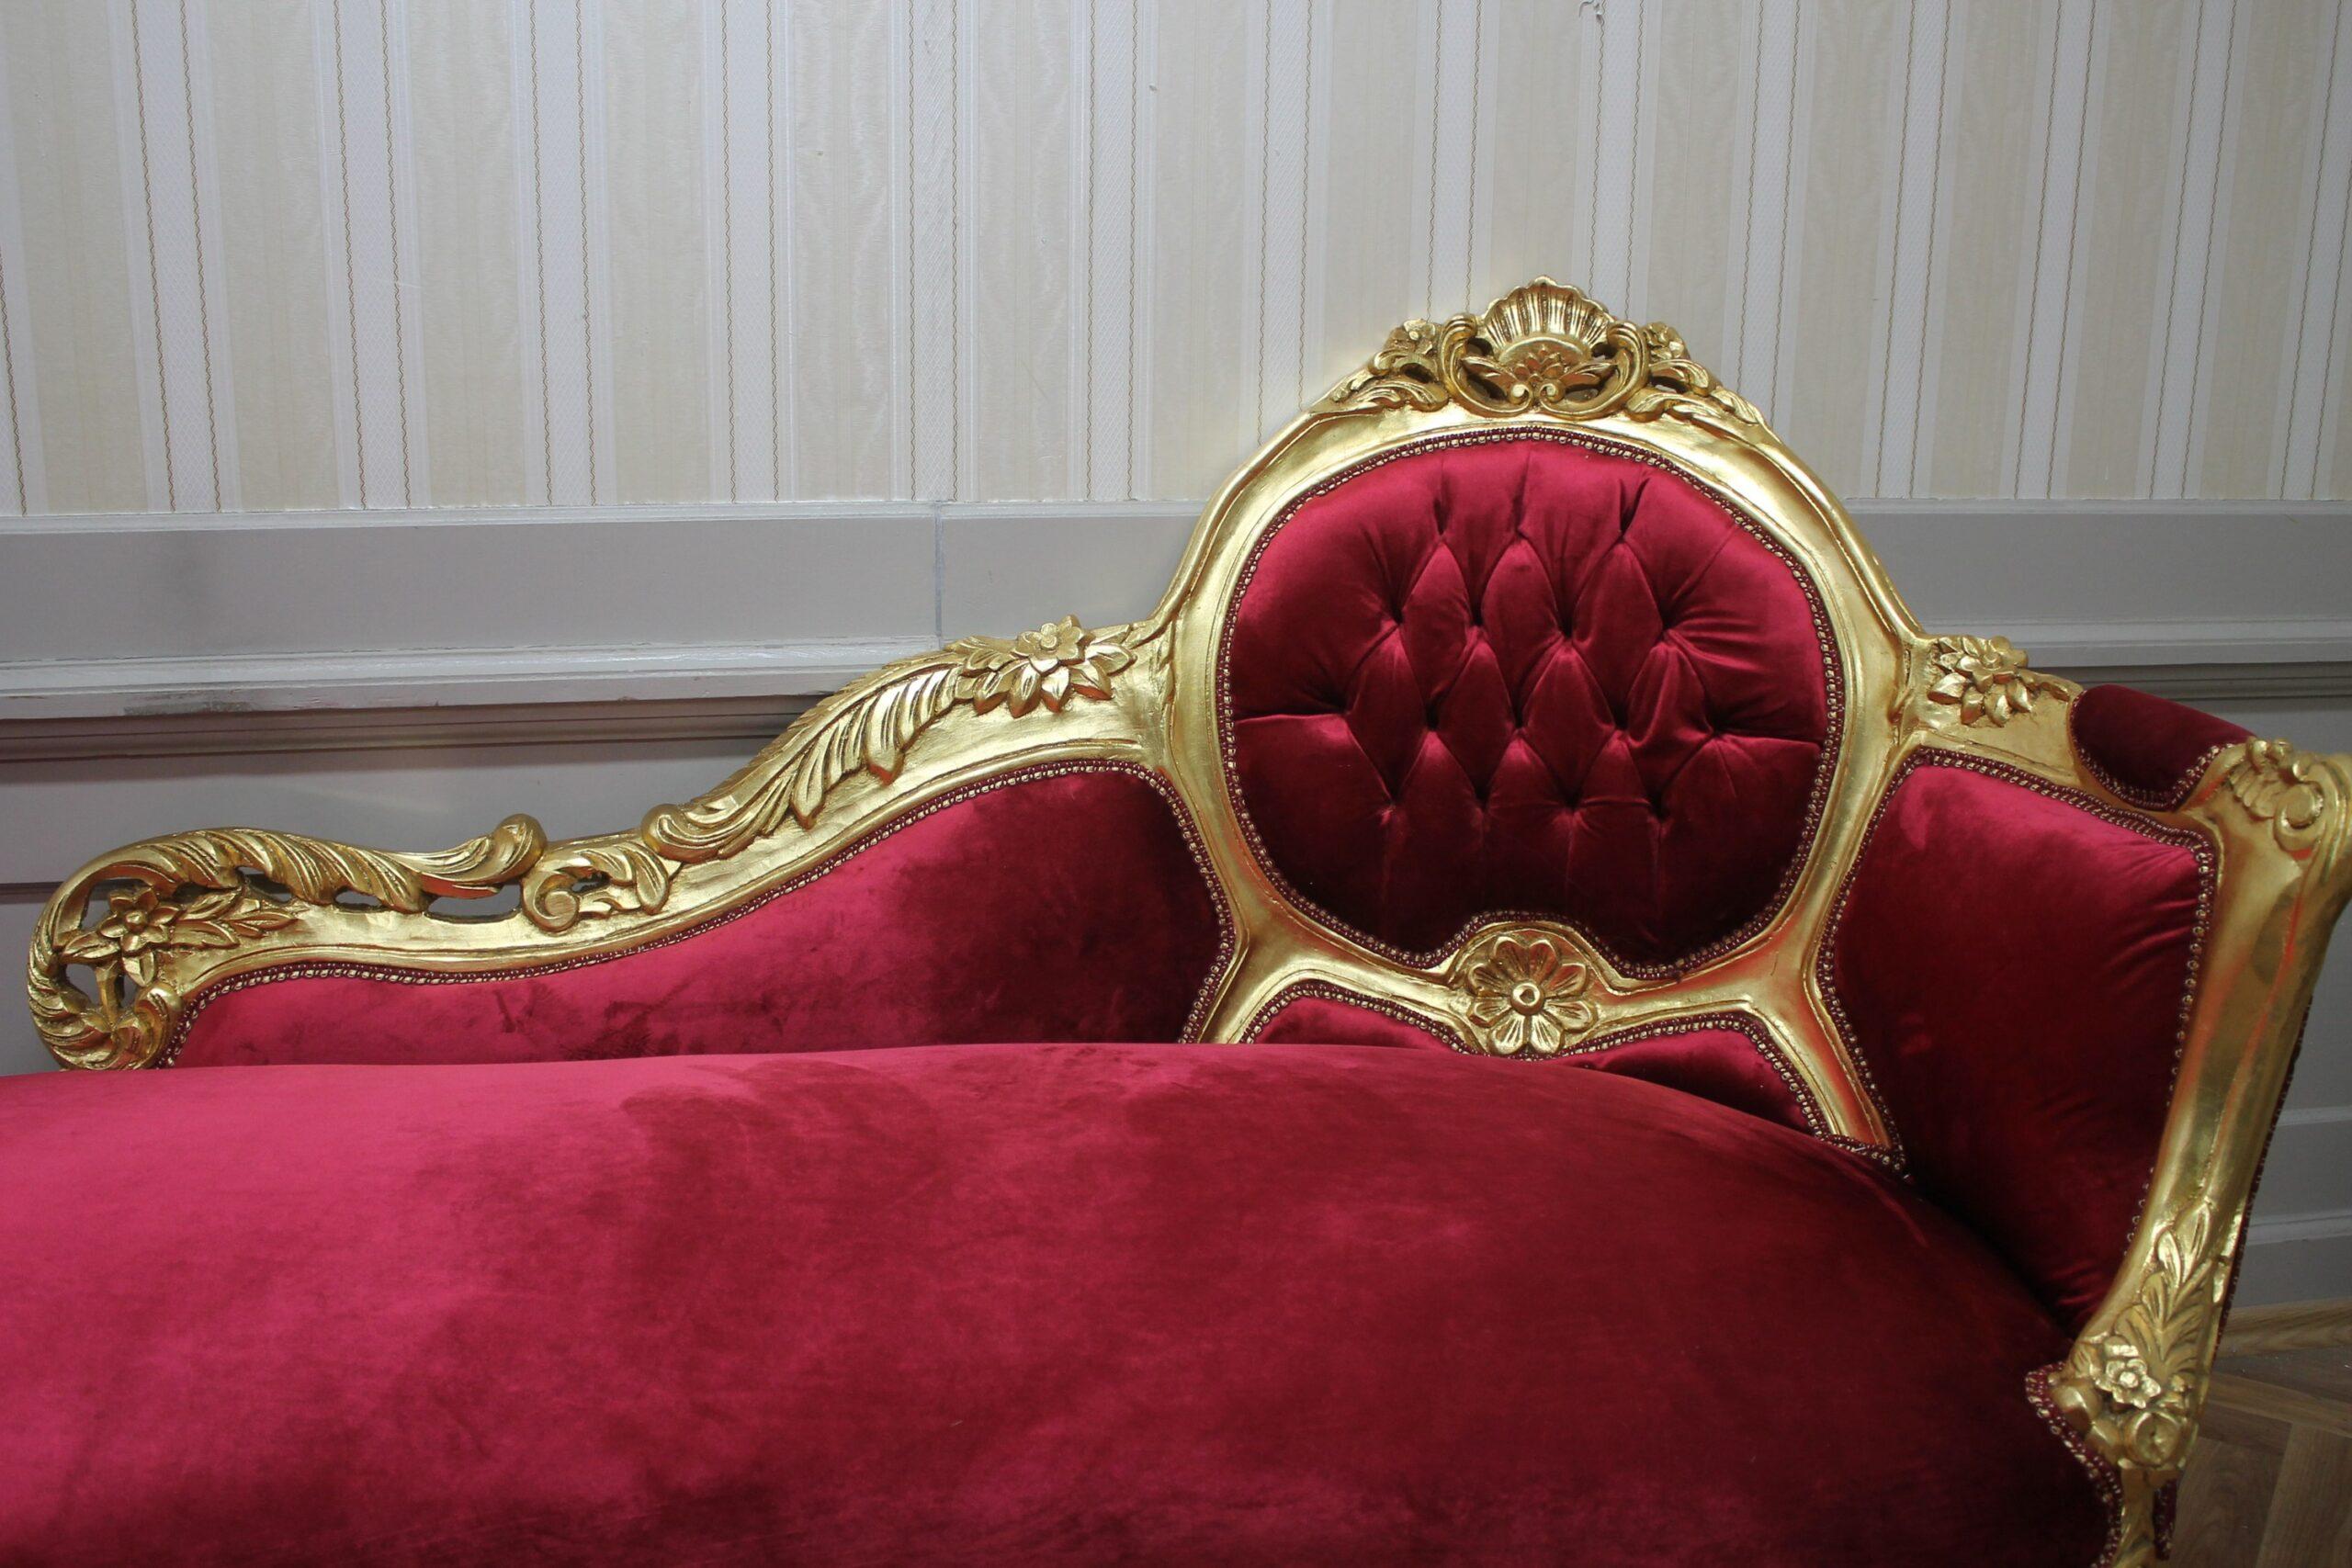 Full Size of Recamiere Barock Diplomatie Chaiselongue Rot Boudoir Mobel Aus Agypten Caseconradcom Sofa Bett Mit Wohnzimmer Recamiere Barock